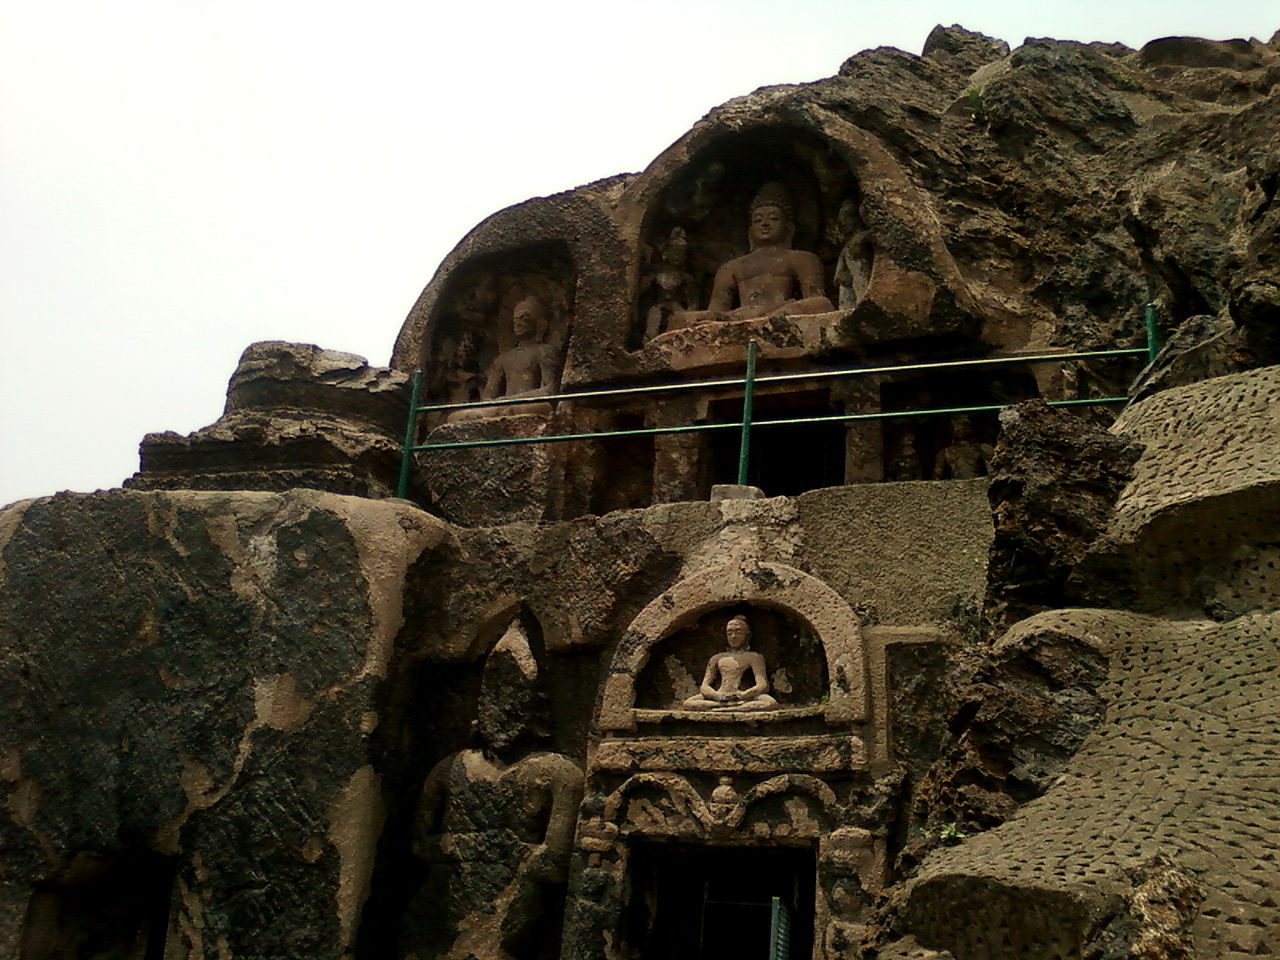 Bojjannakonda - Place to Visit in Lambasingi, The Kashmir of Andhra Pradesh